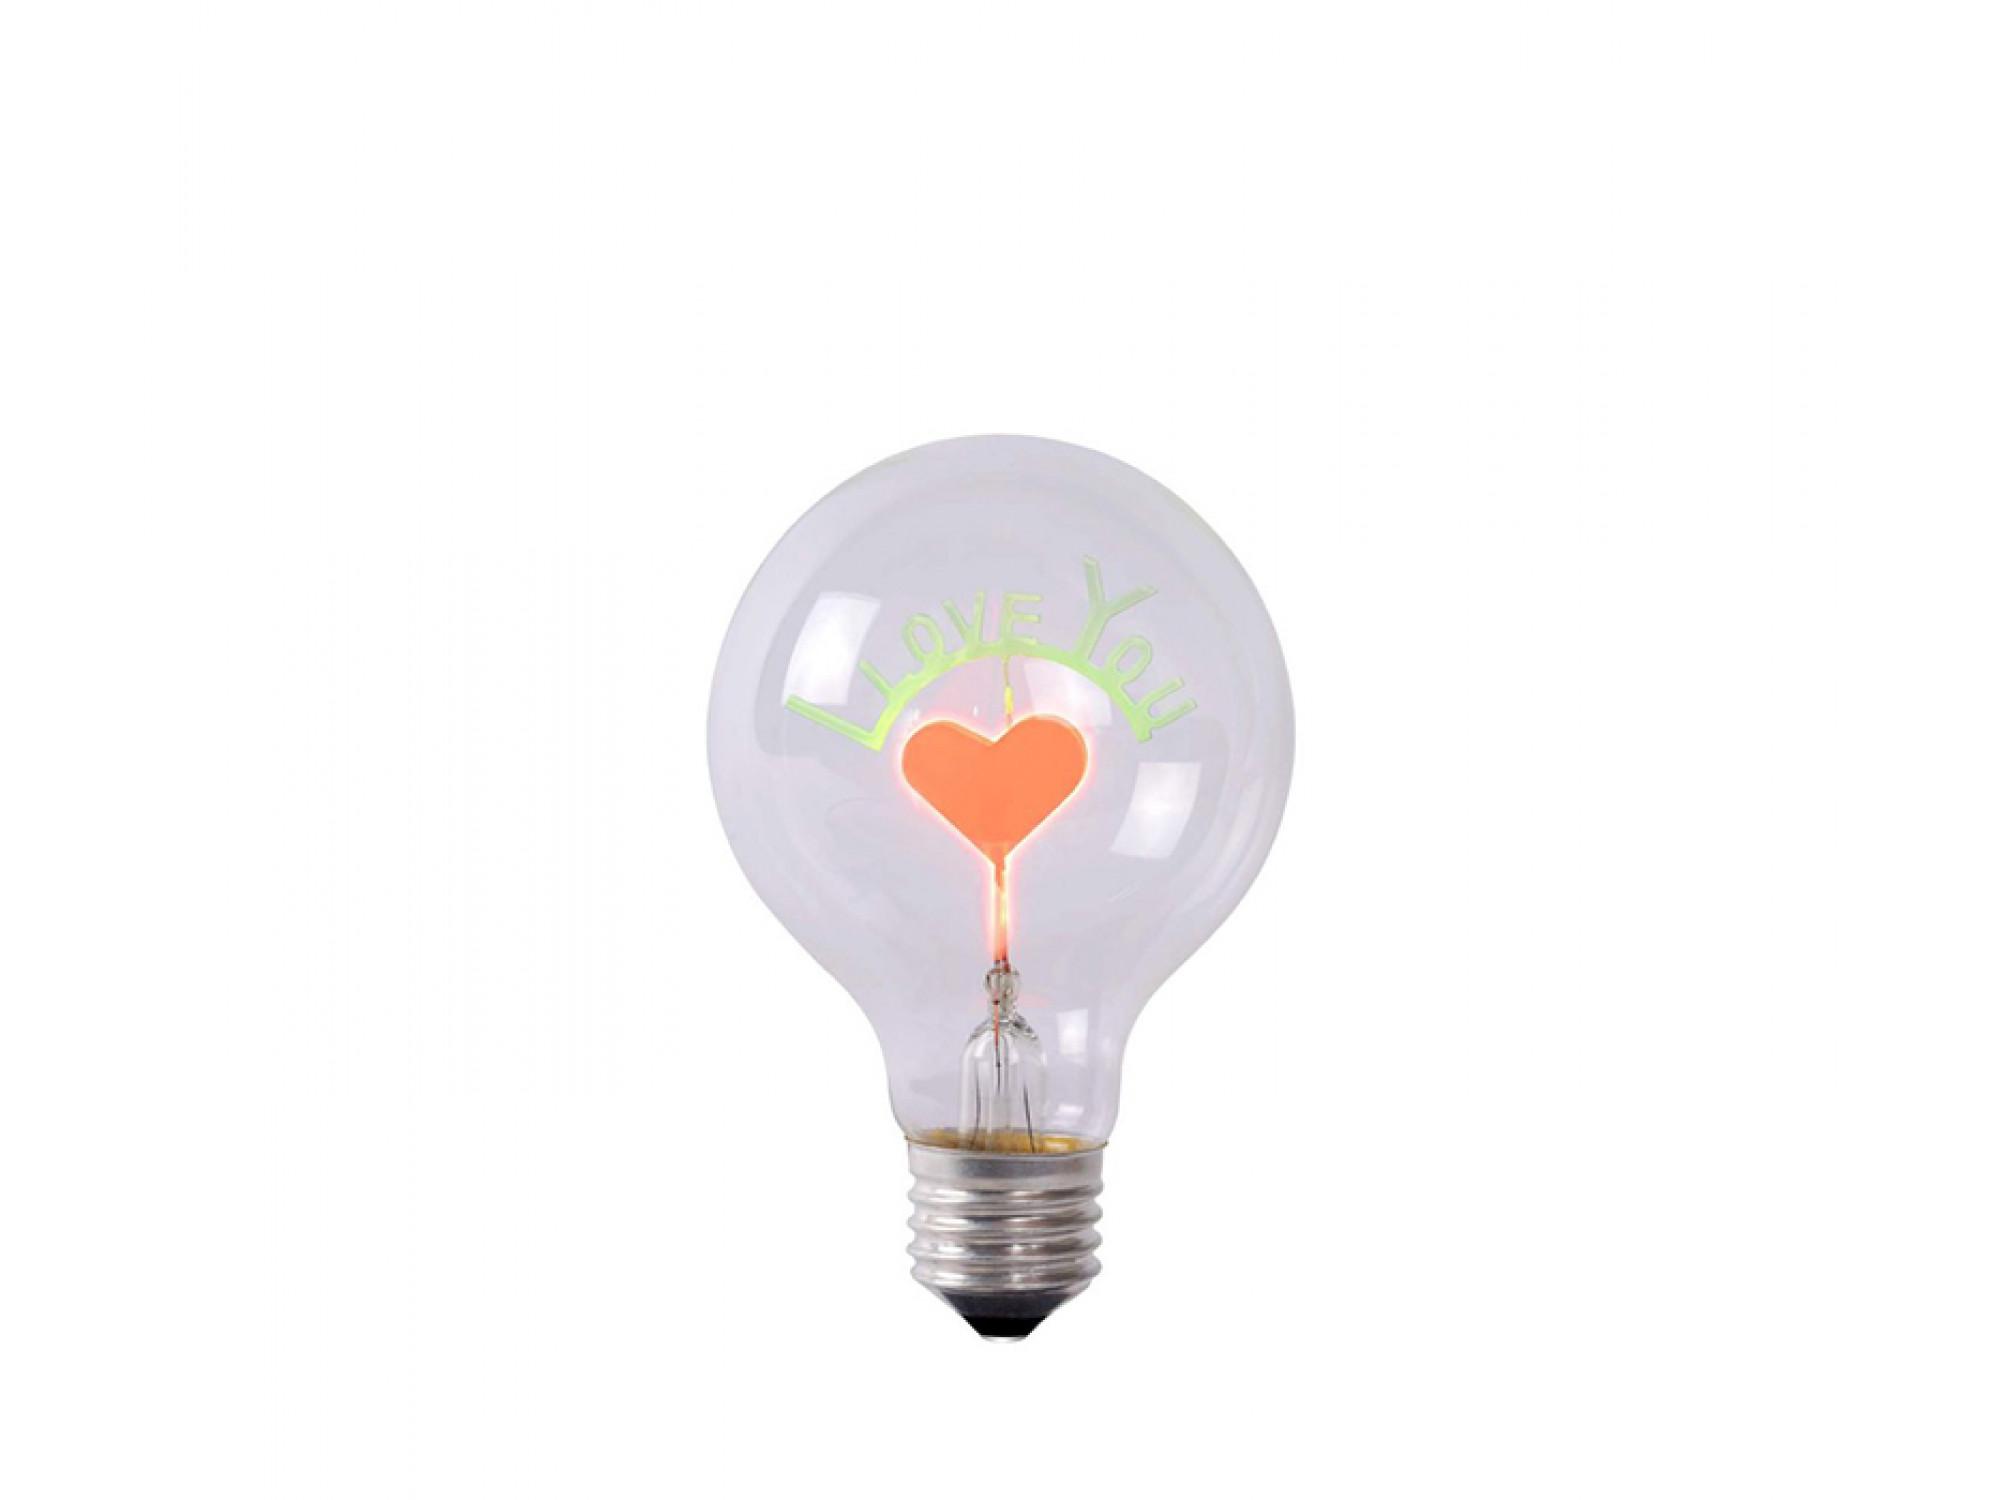 լամպ LUCIDE 49037/03/60 LED BULB-I LOVE YOU